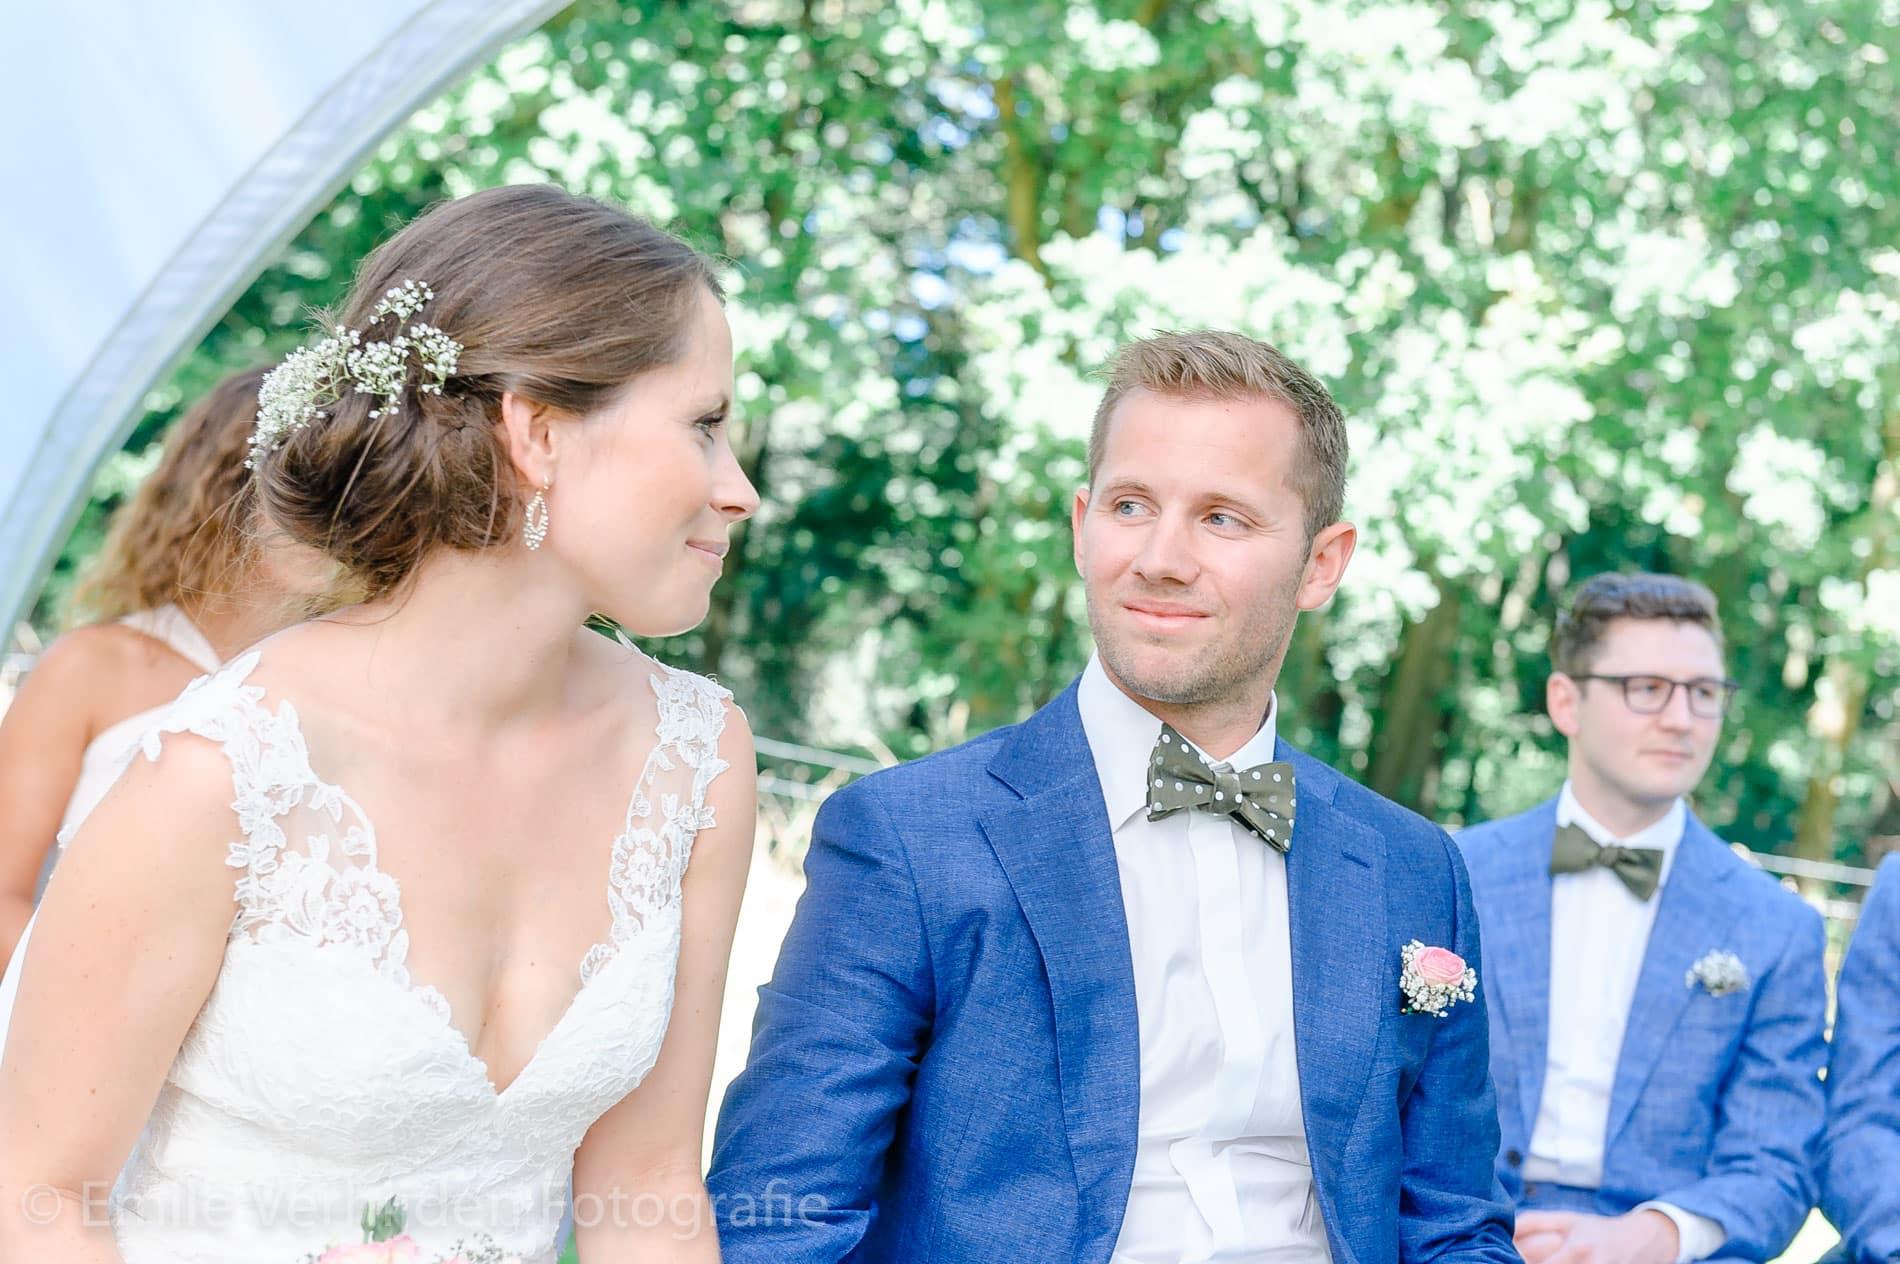 Bijna getrouwd - Bruidsfotografie Winselerhof Landgraaf - Kerkrade